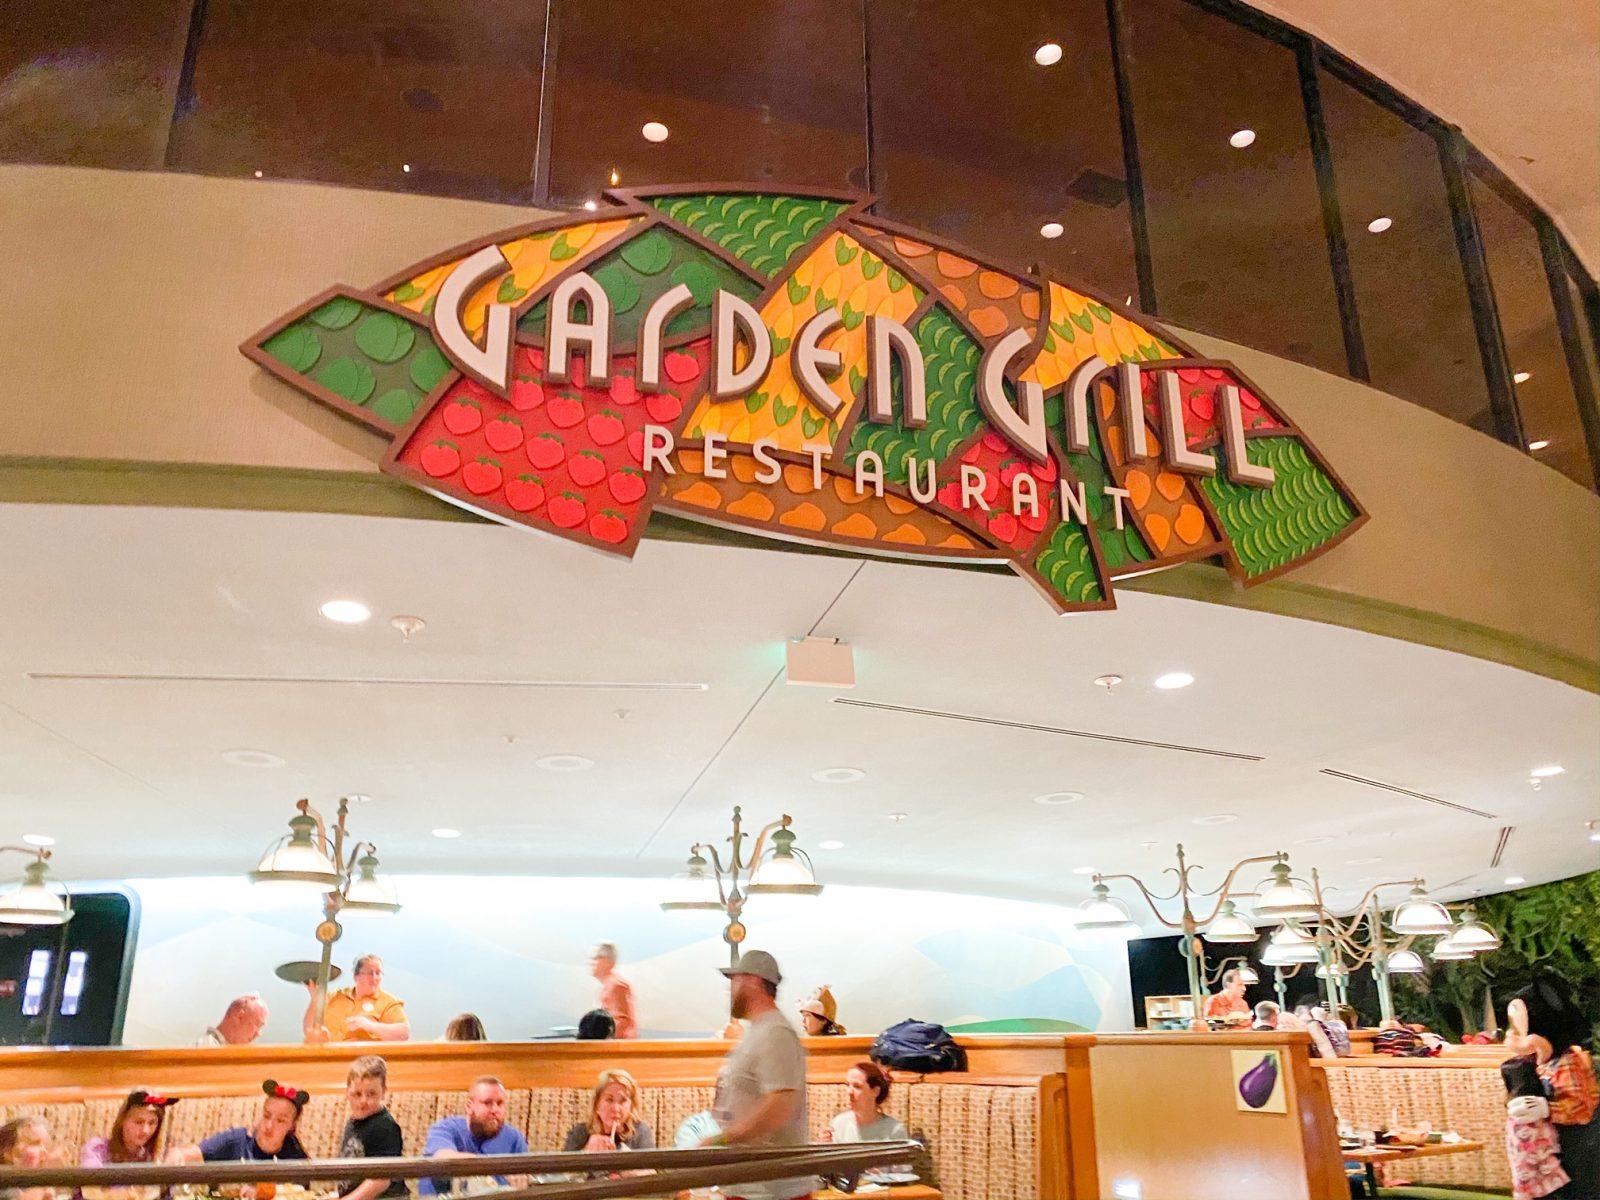 Garden Grill Restaurant Sign